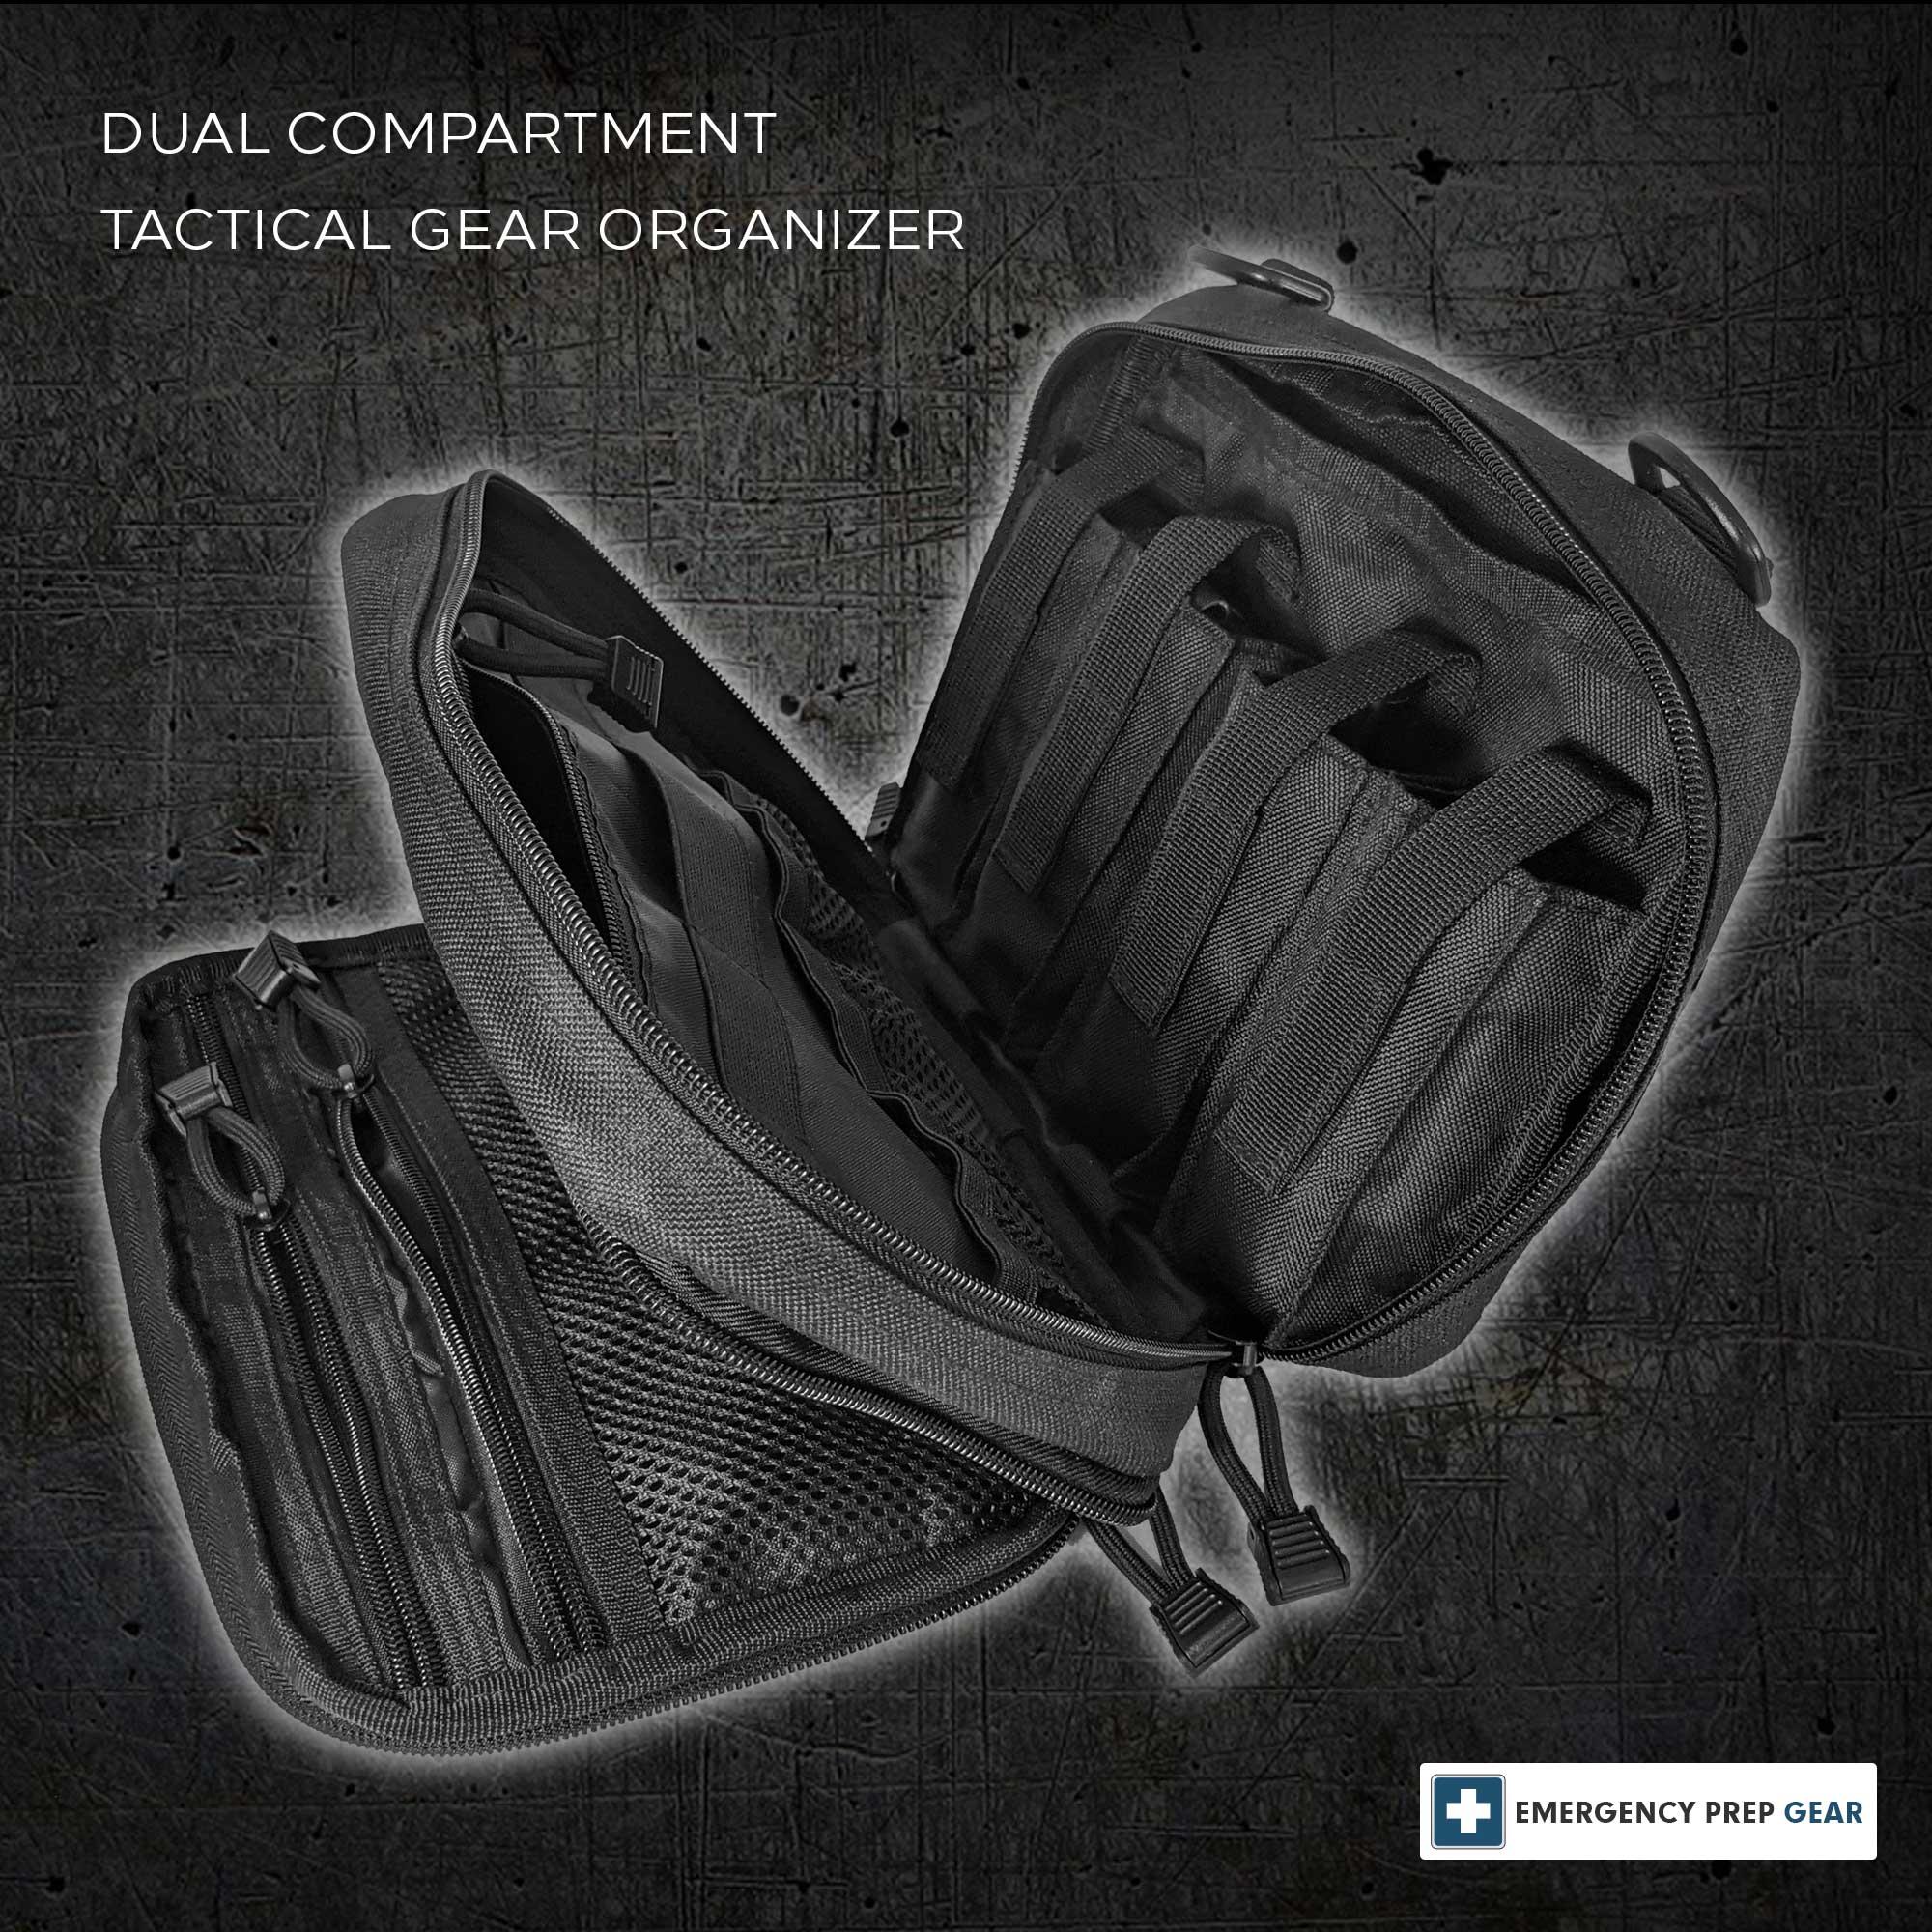 21 10 01 14 38 23 original b09dqz9vnl epg gear black compartments